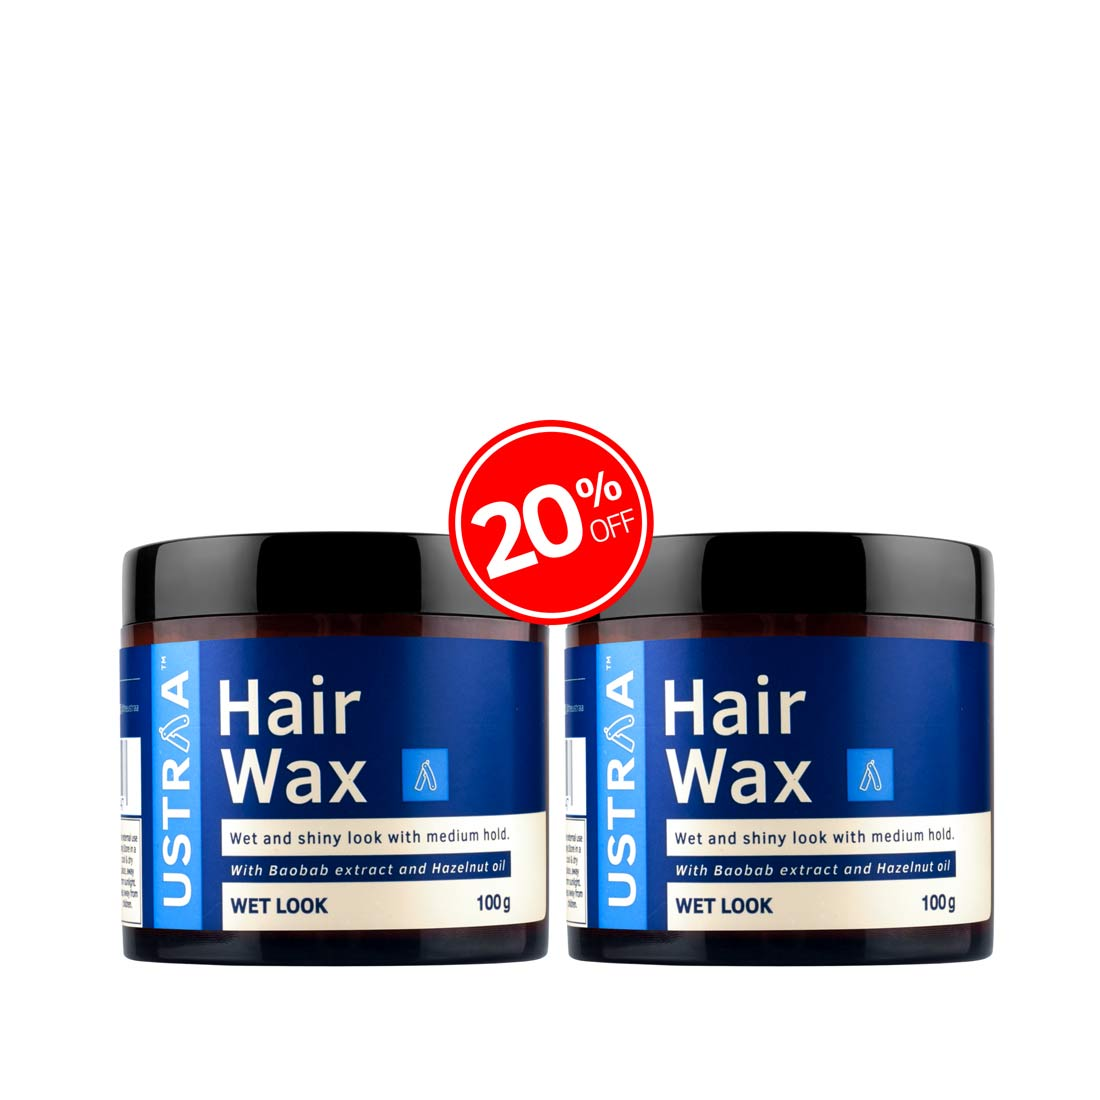 Hair Wax Wet Look - Set of 2